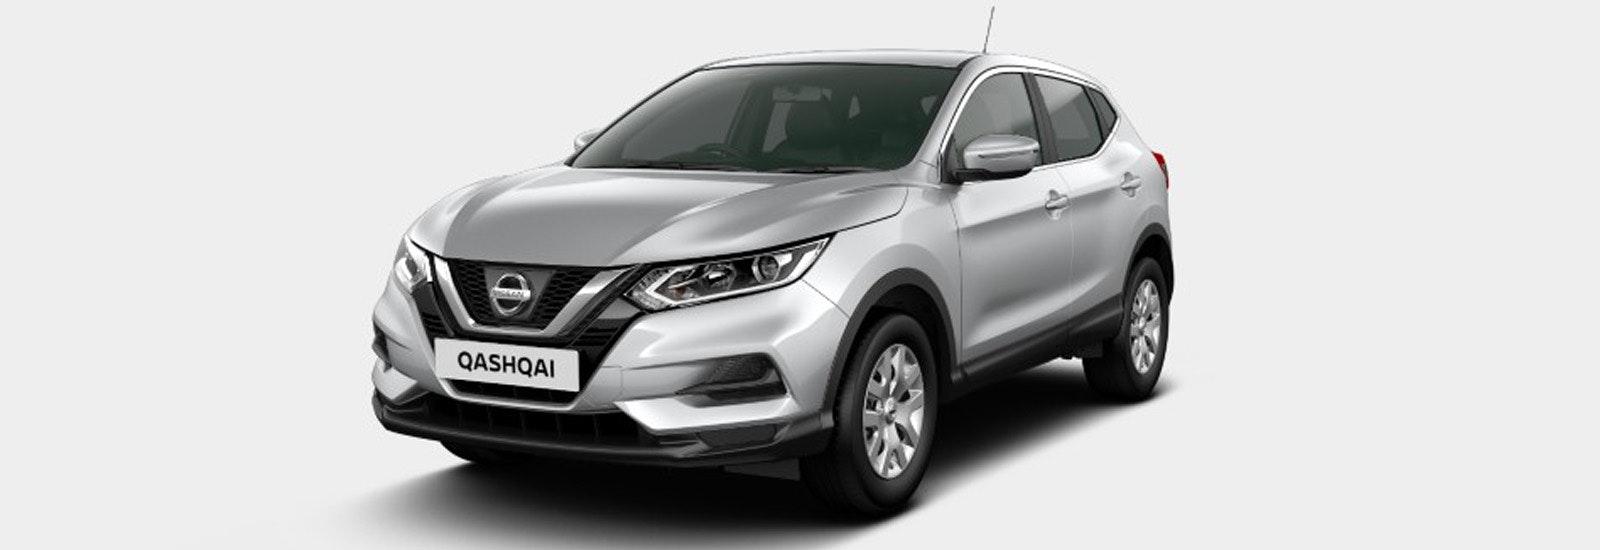 Nissan Qashqai 2018 White >> Nissan Qashqai colours guide and prices | carwow